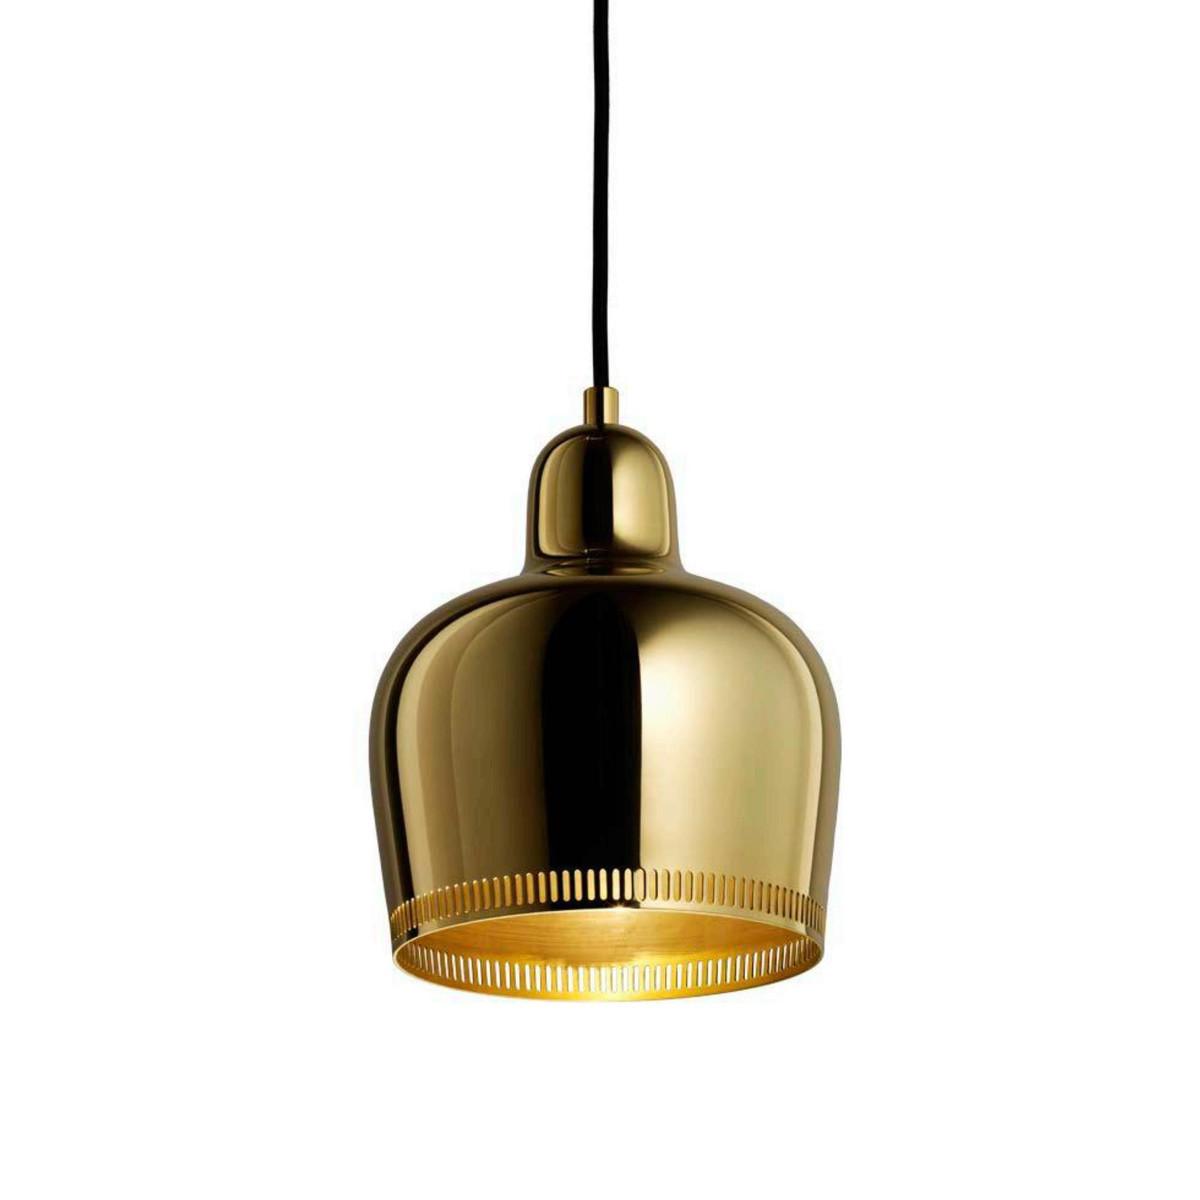 vitra lighting. Vitra Lighting Ideas